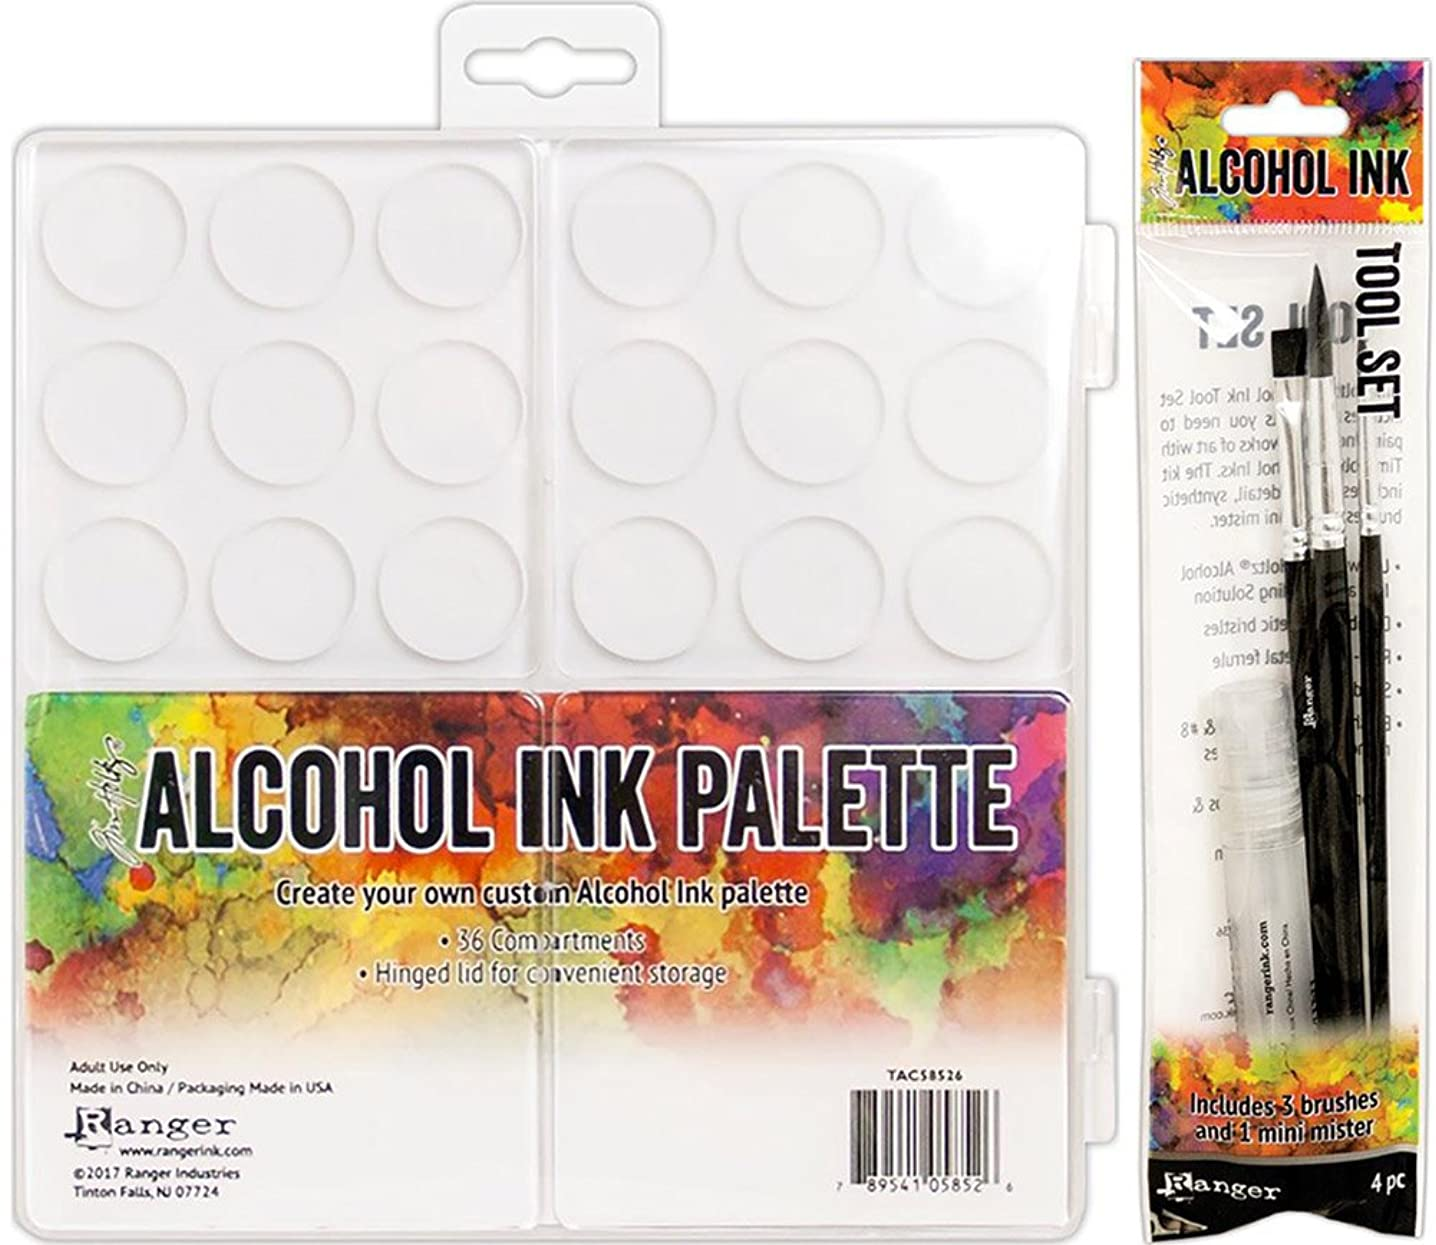 Tim Holtz Alcohol Ink Palette and Alcohol Ink Tool Set Bundle (Set of 2 Items)